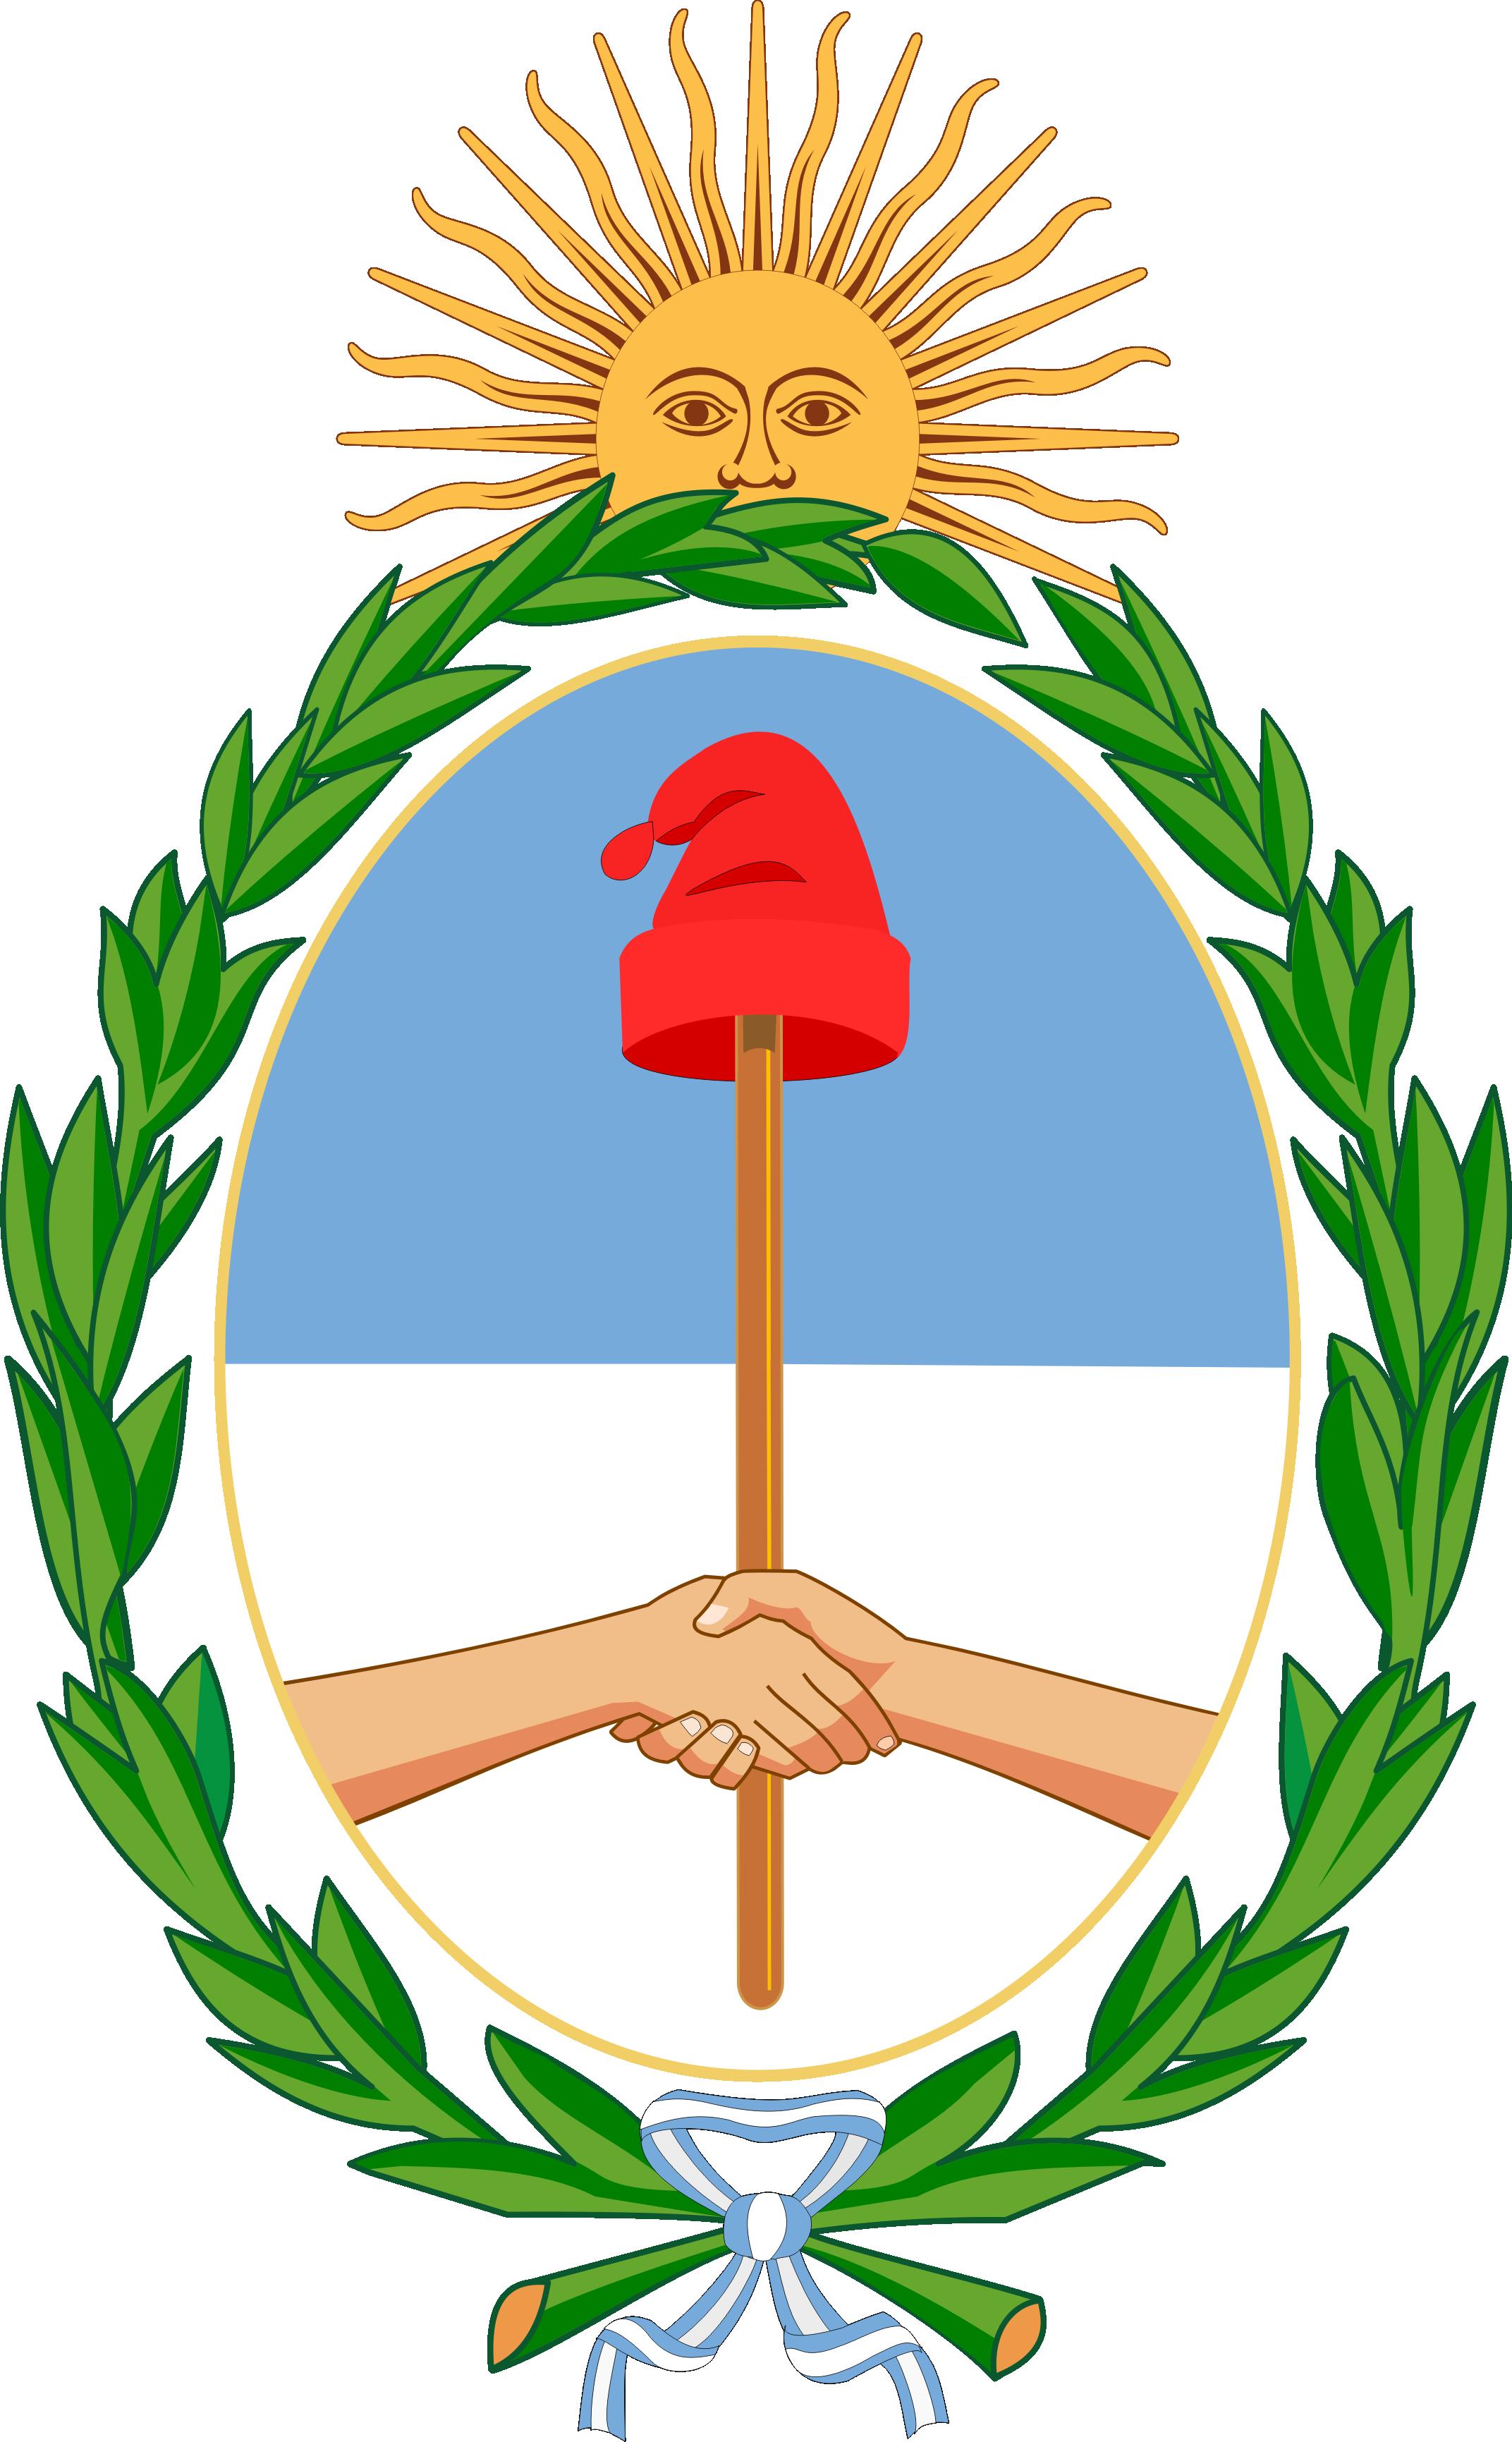 Аргентинский герб